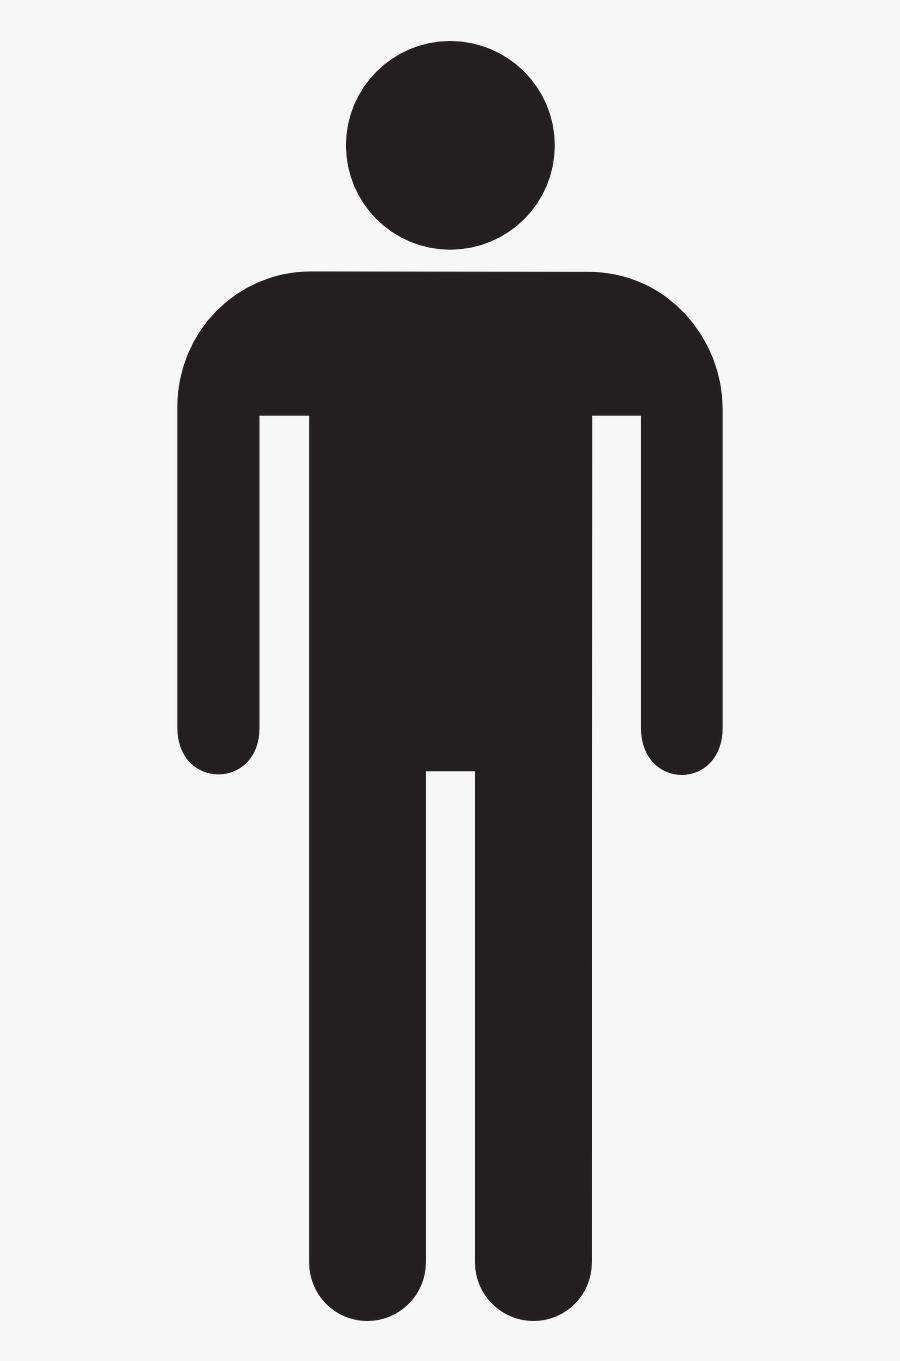 Male Man Stick Figure Symbol Png Image - Man Stick Figure Transparent, Transparent Clipart